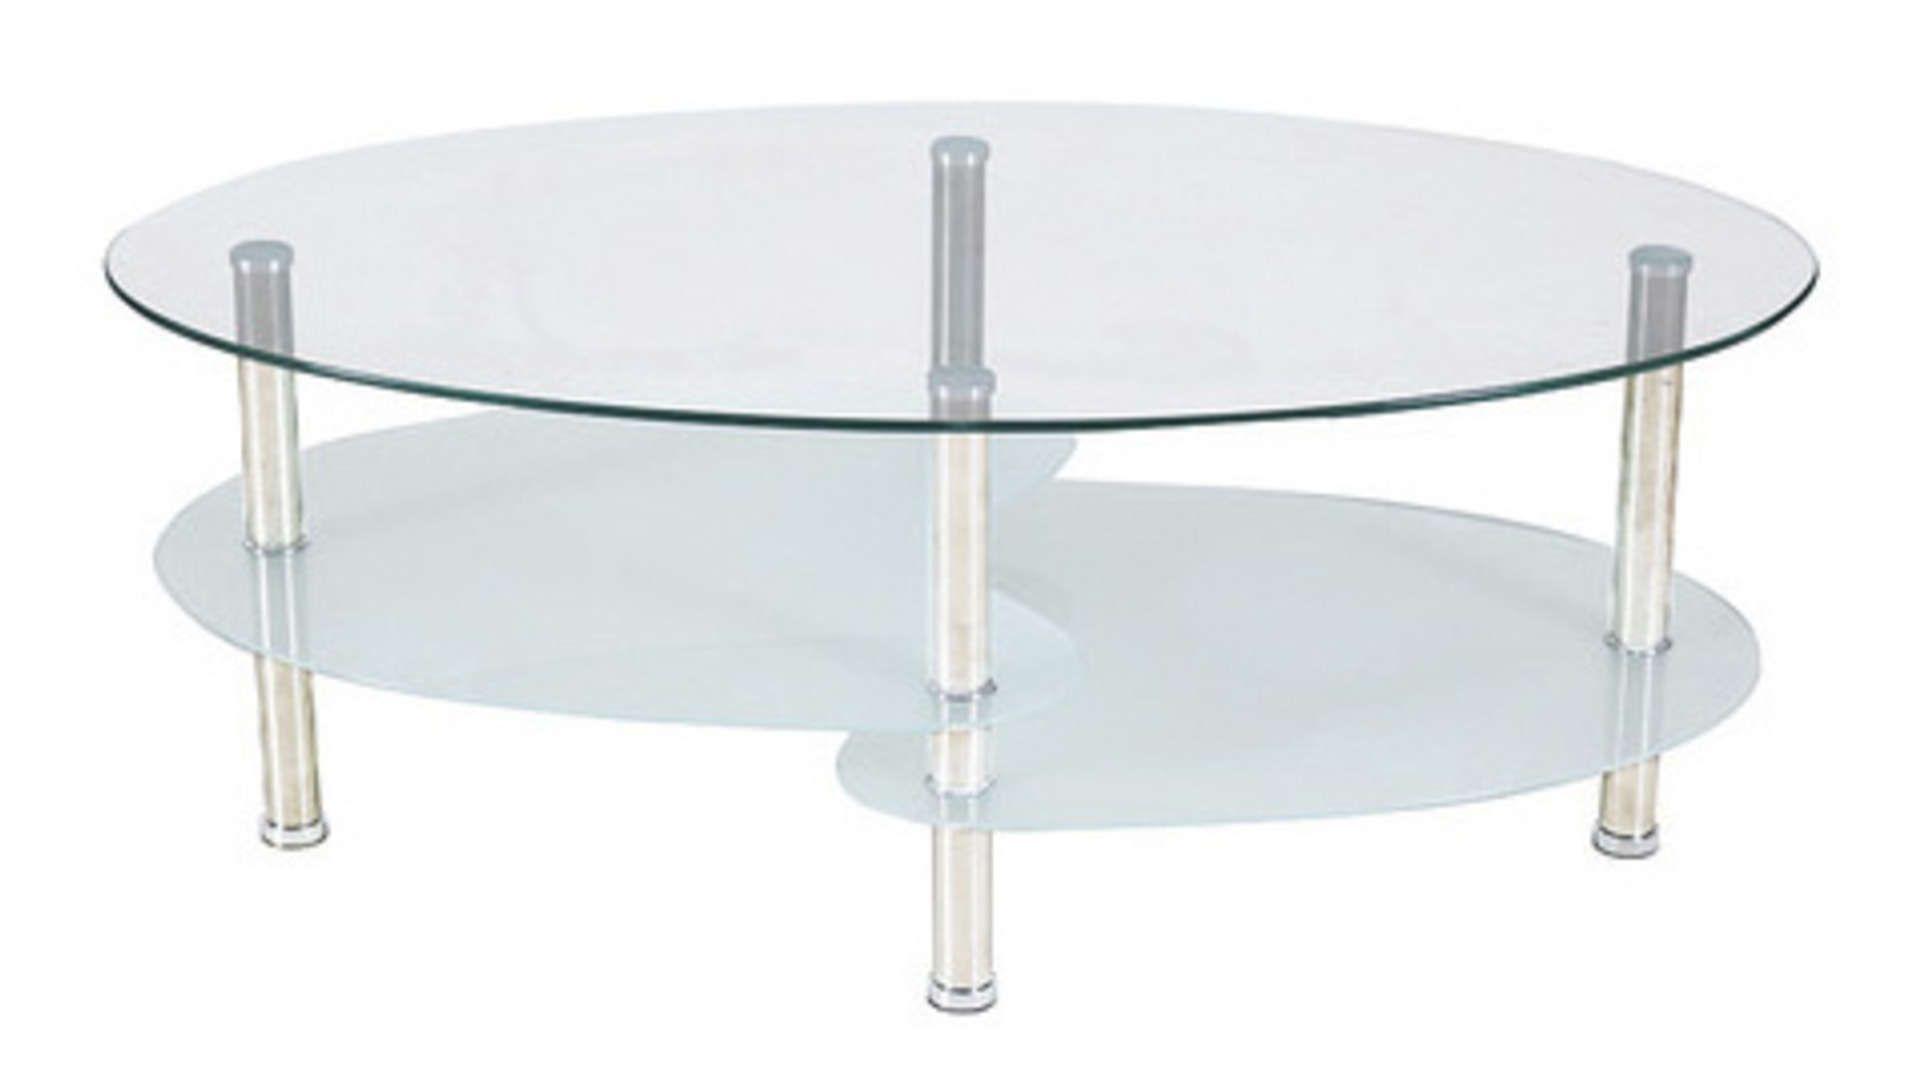 Table Basse Glassy En 2020 Table Basse Table Basse Conforama Et